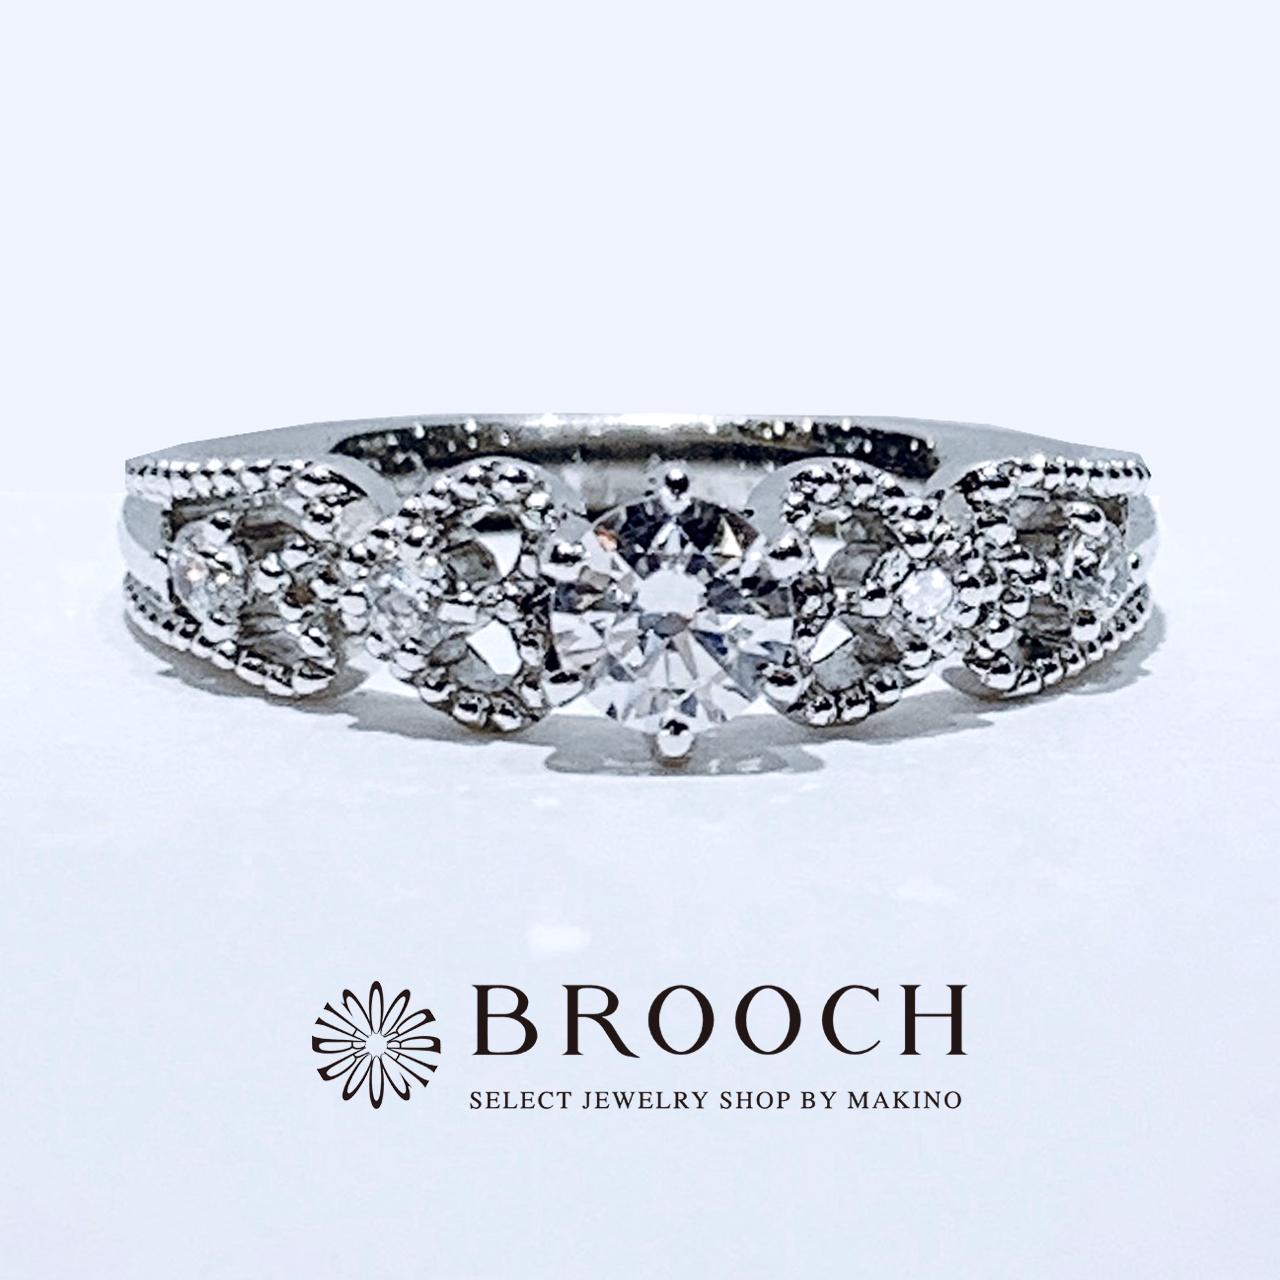 BROOCH 婚約指輪 エンゲージリング プリンセス風デザイン